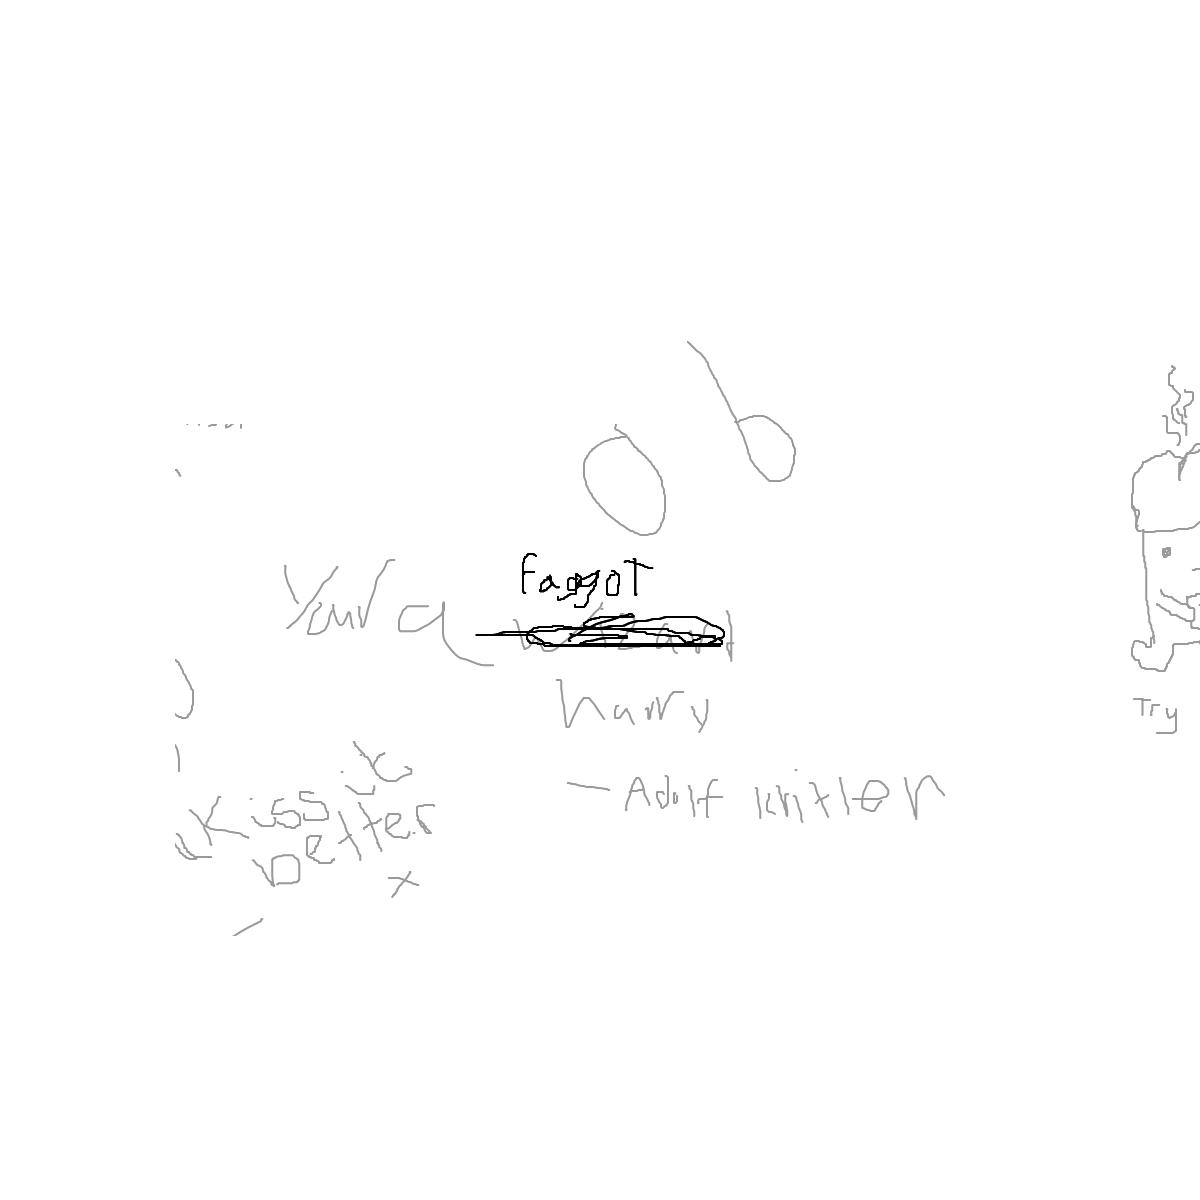 BAAAM drawing#1738 lat:51.4956970214843750lng: -2.5085790157318115